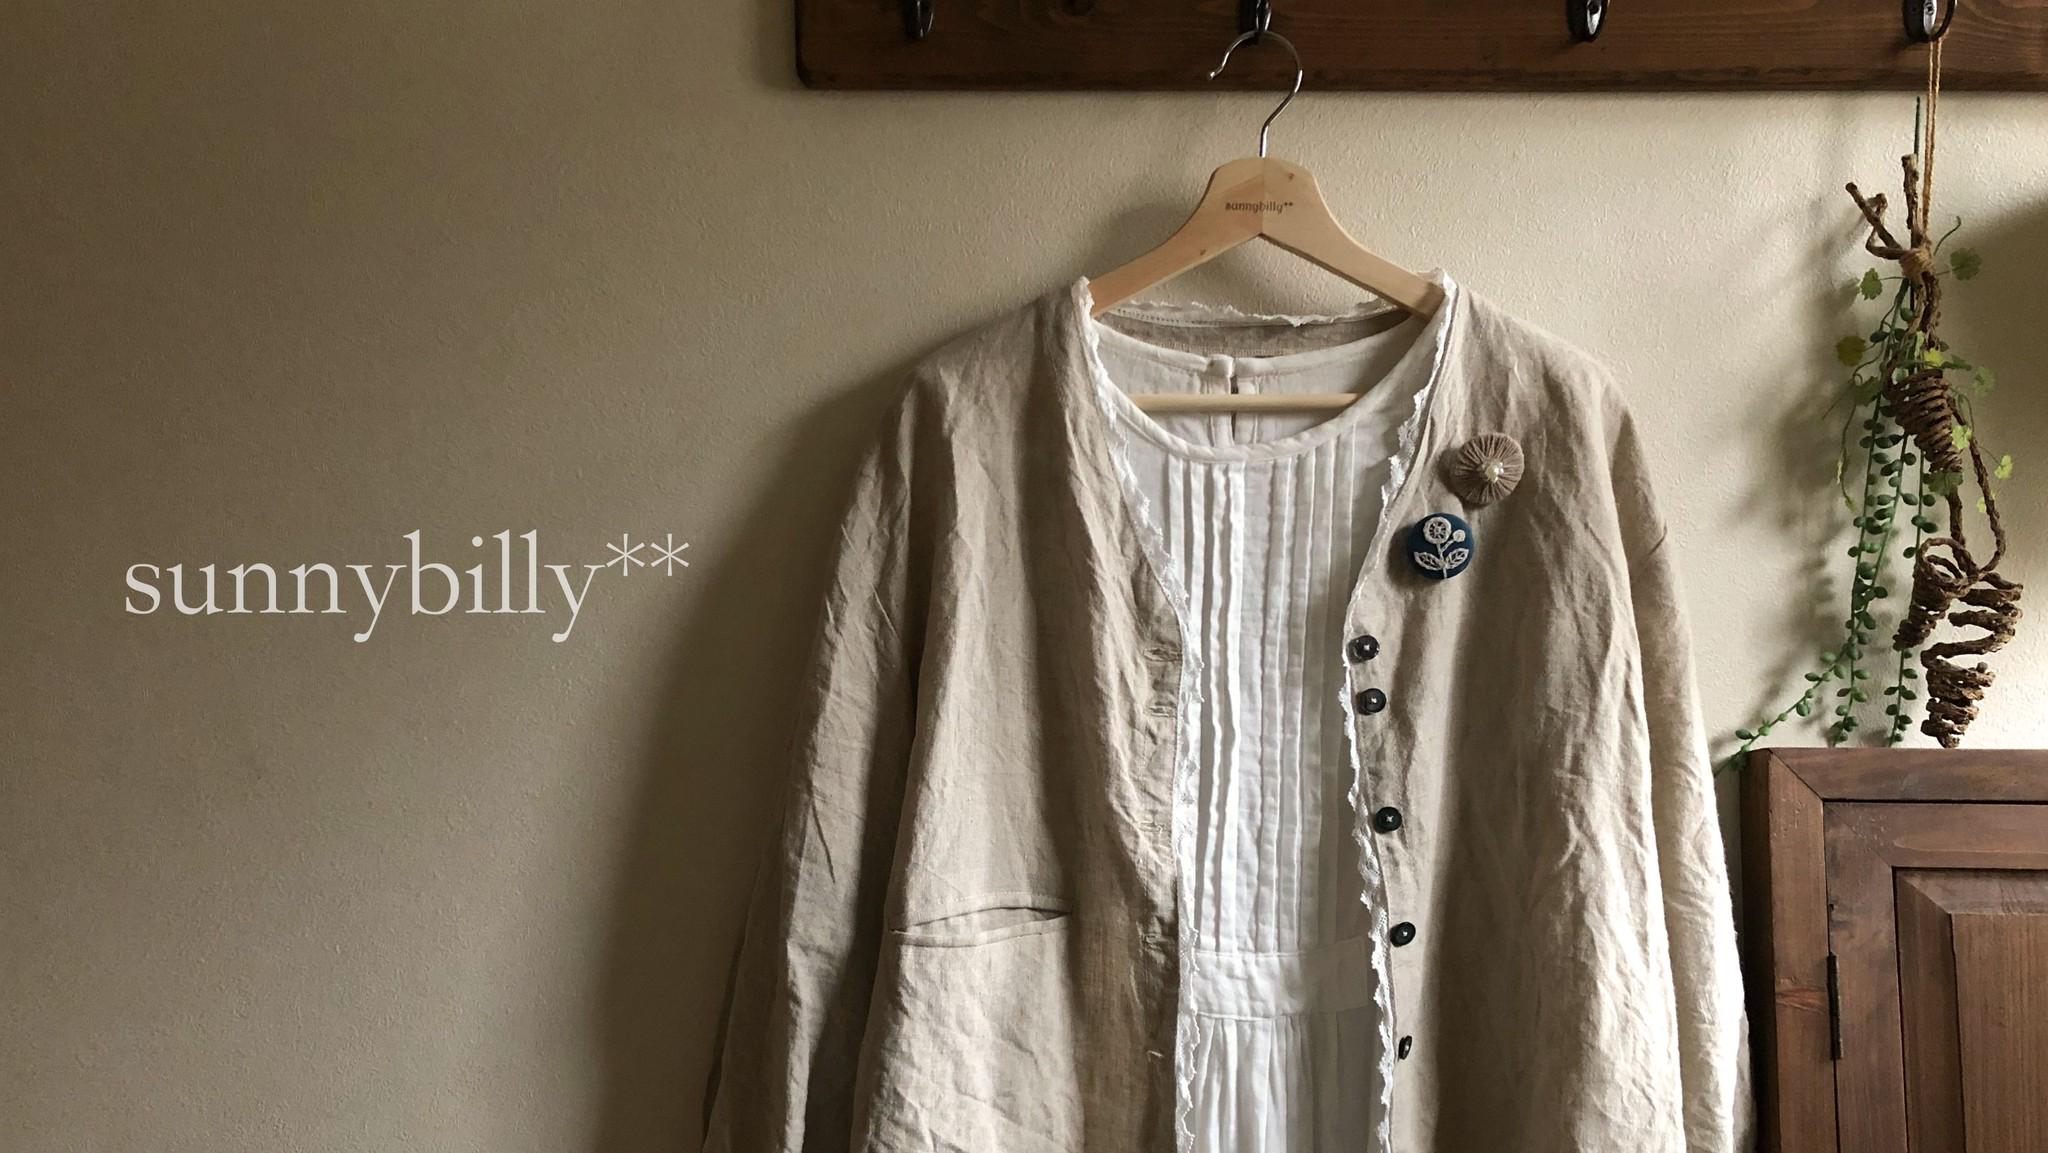 handmade『sunnybilly**』